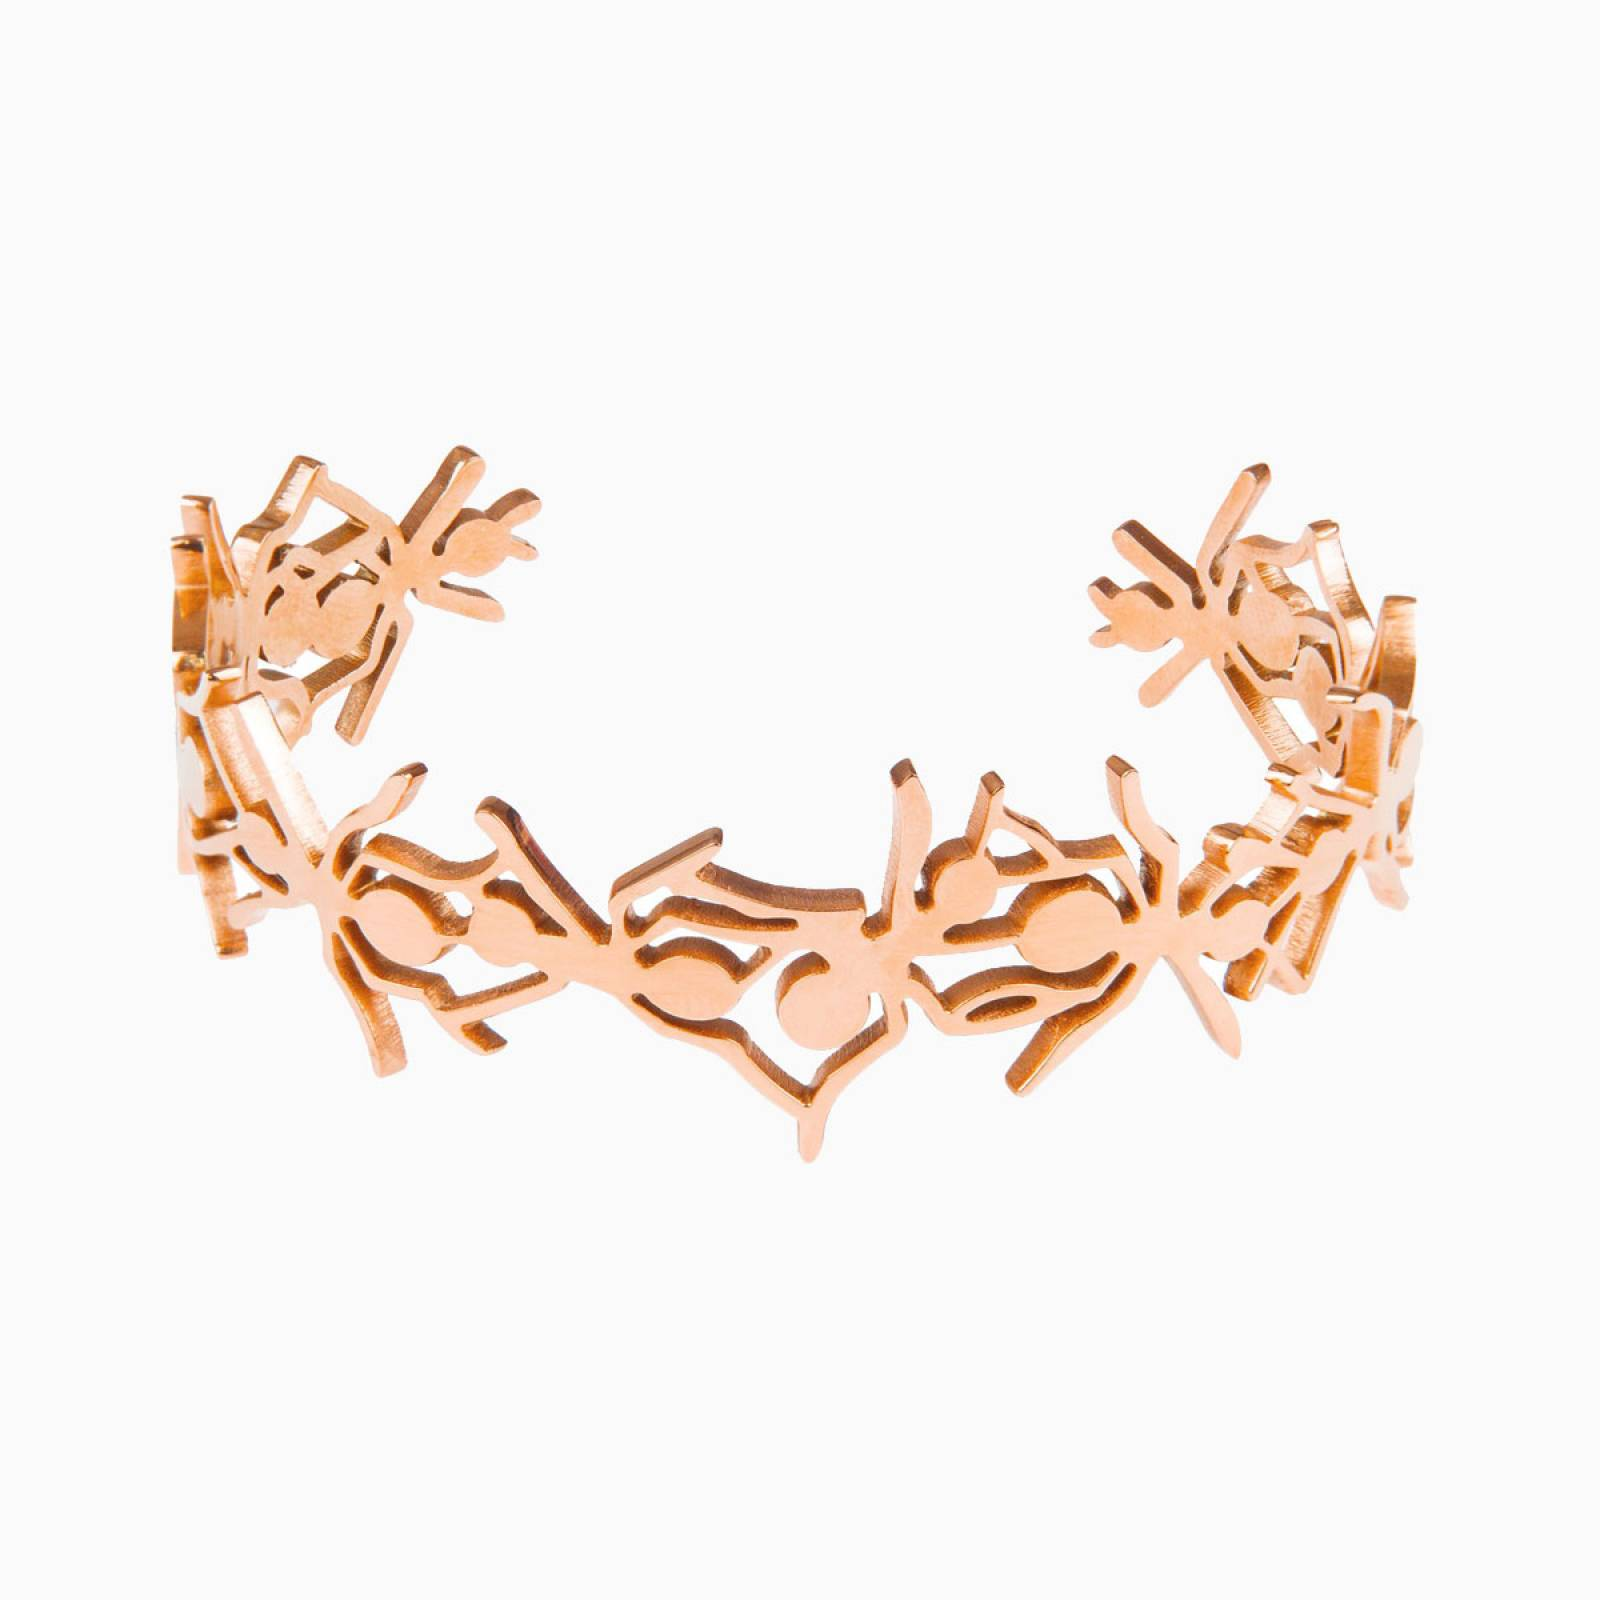 Rose Gold Ant Cuff Bracelet By Esa Evans